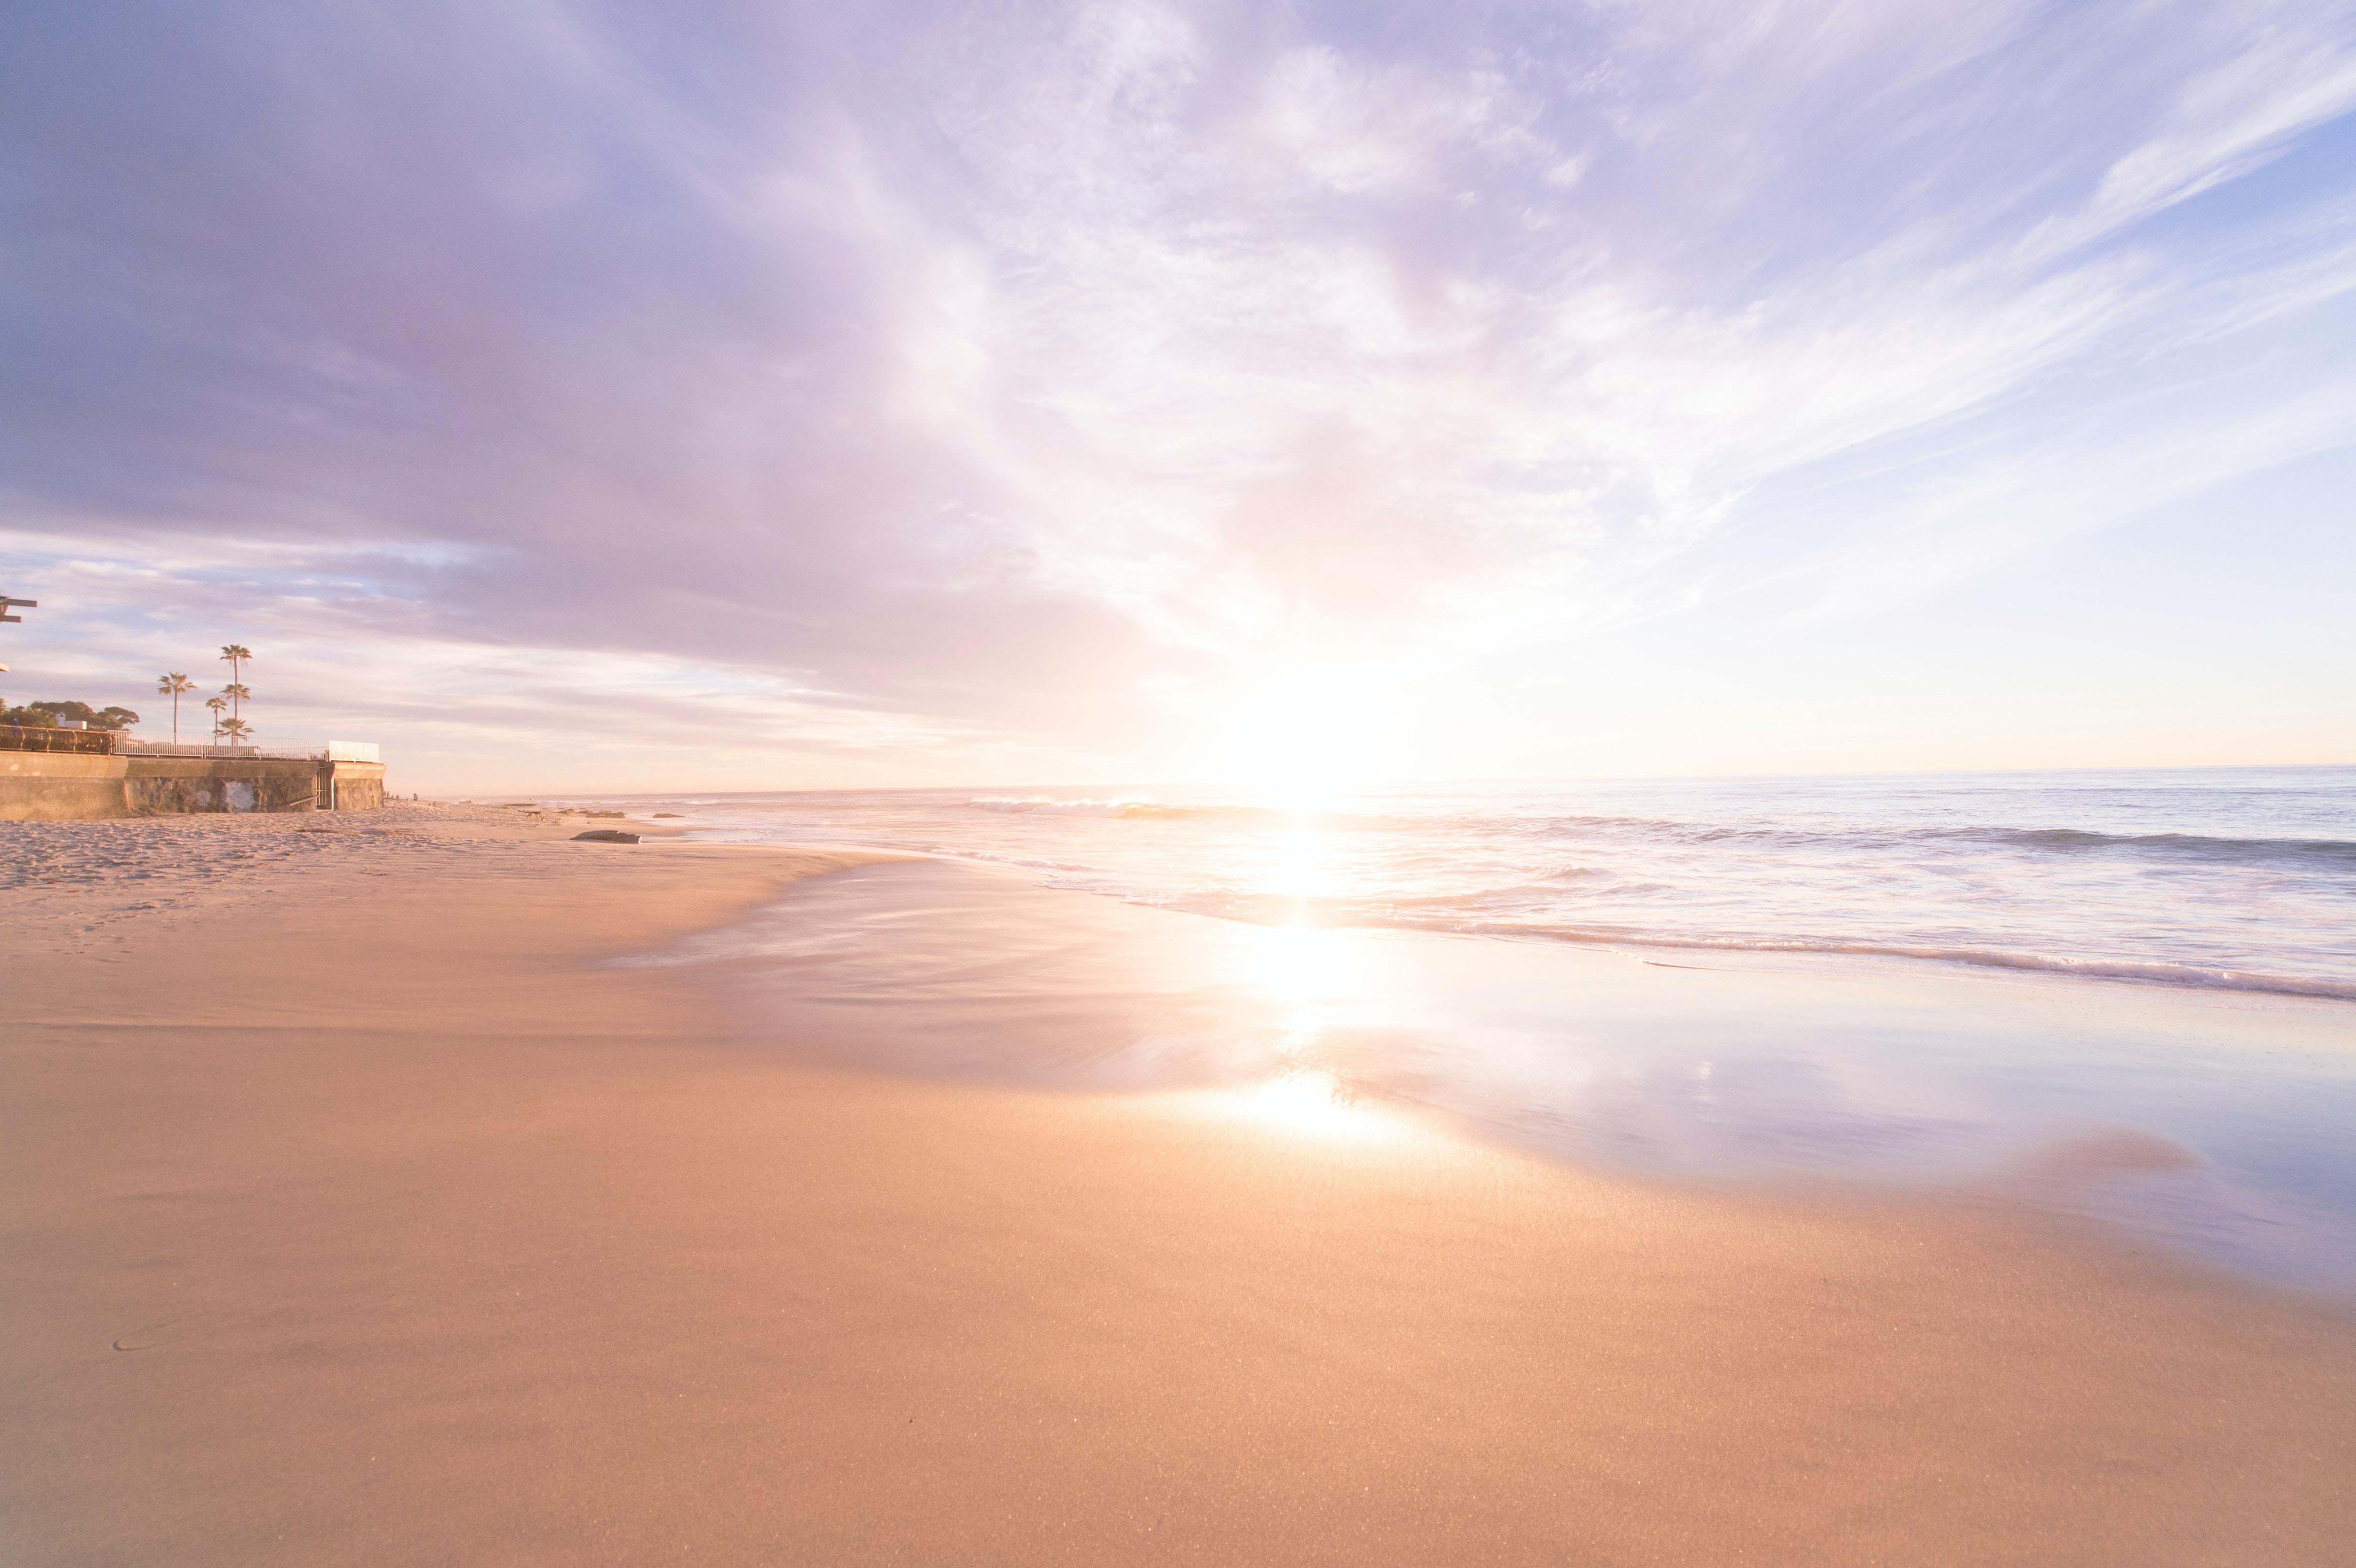 long exposure photography of sea shore